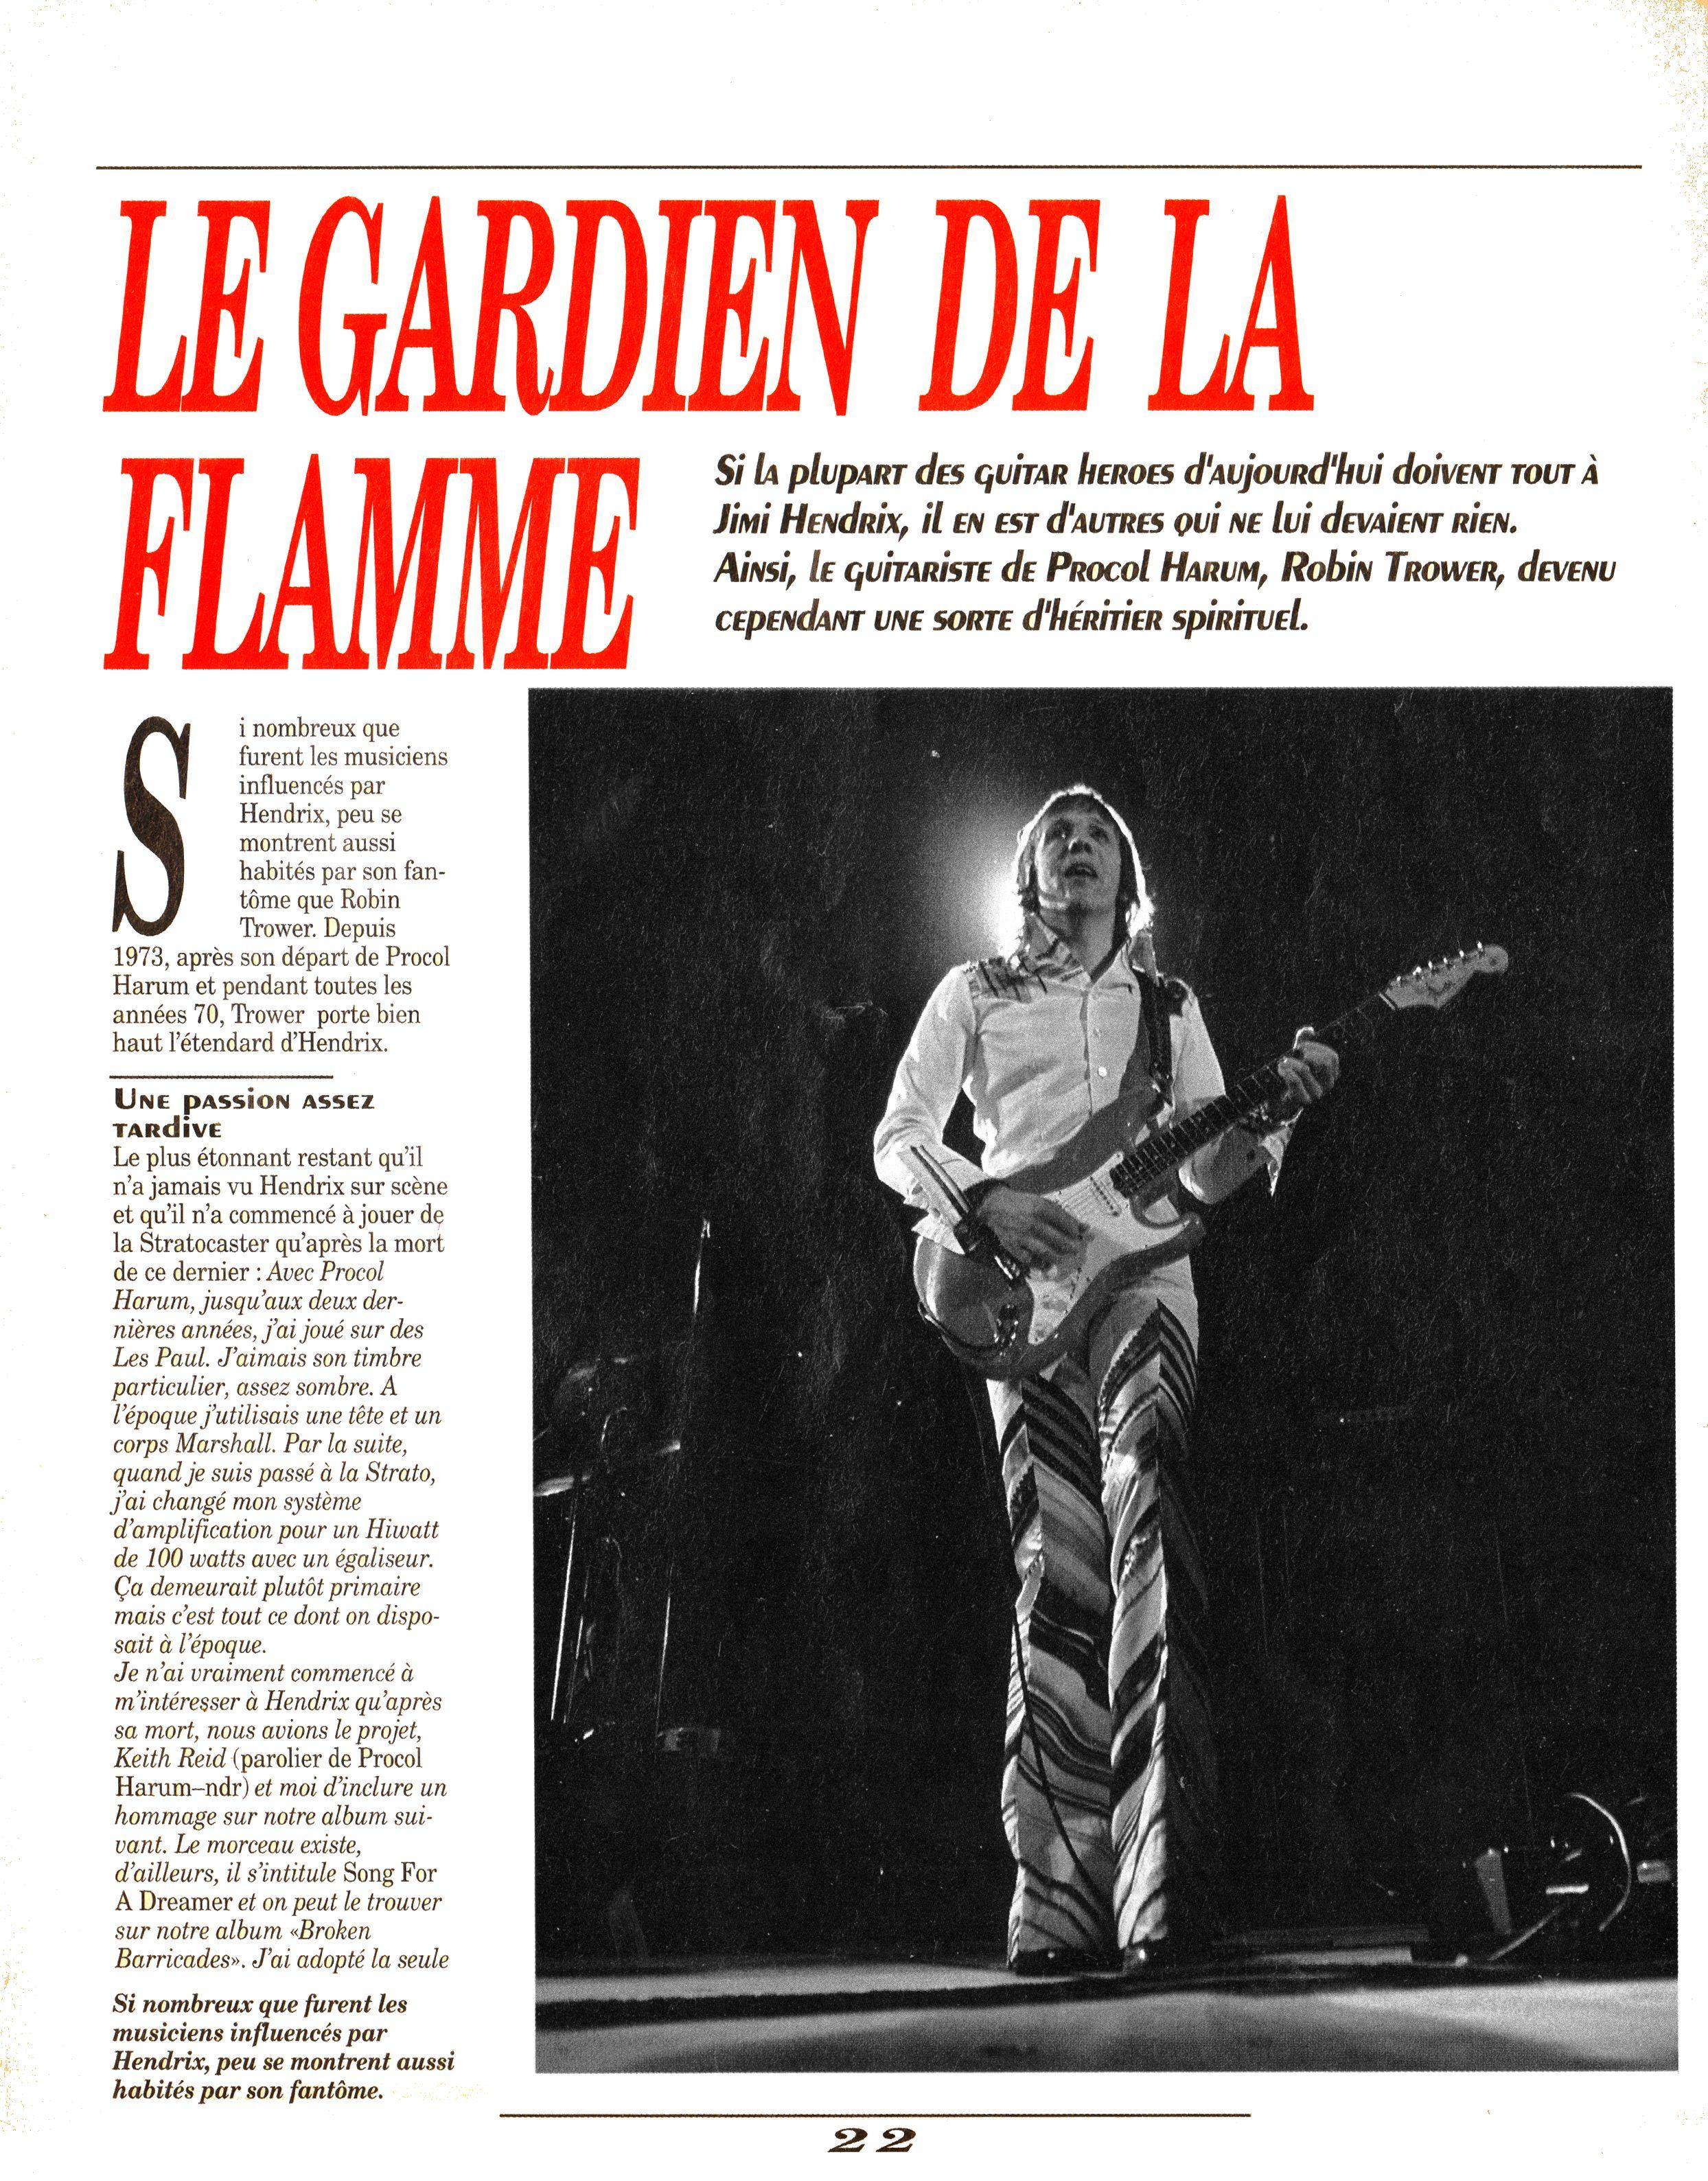 Magazines Français 1989 - 2014 GuitarWorldAvrilMaiJuin1990Page22